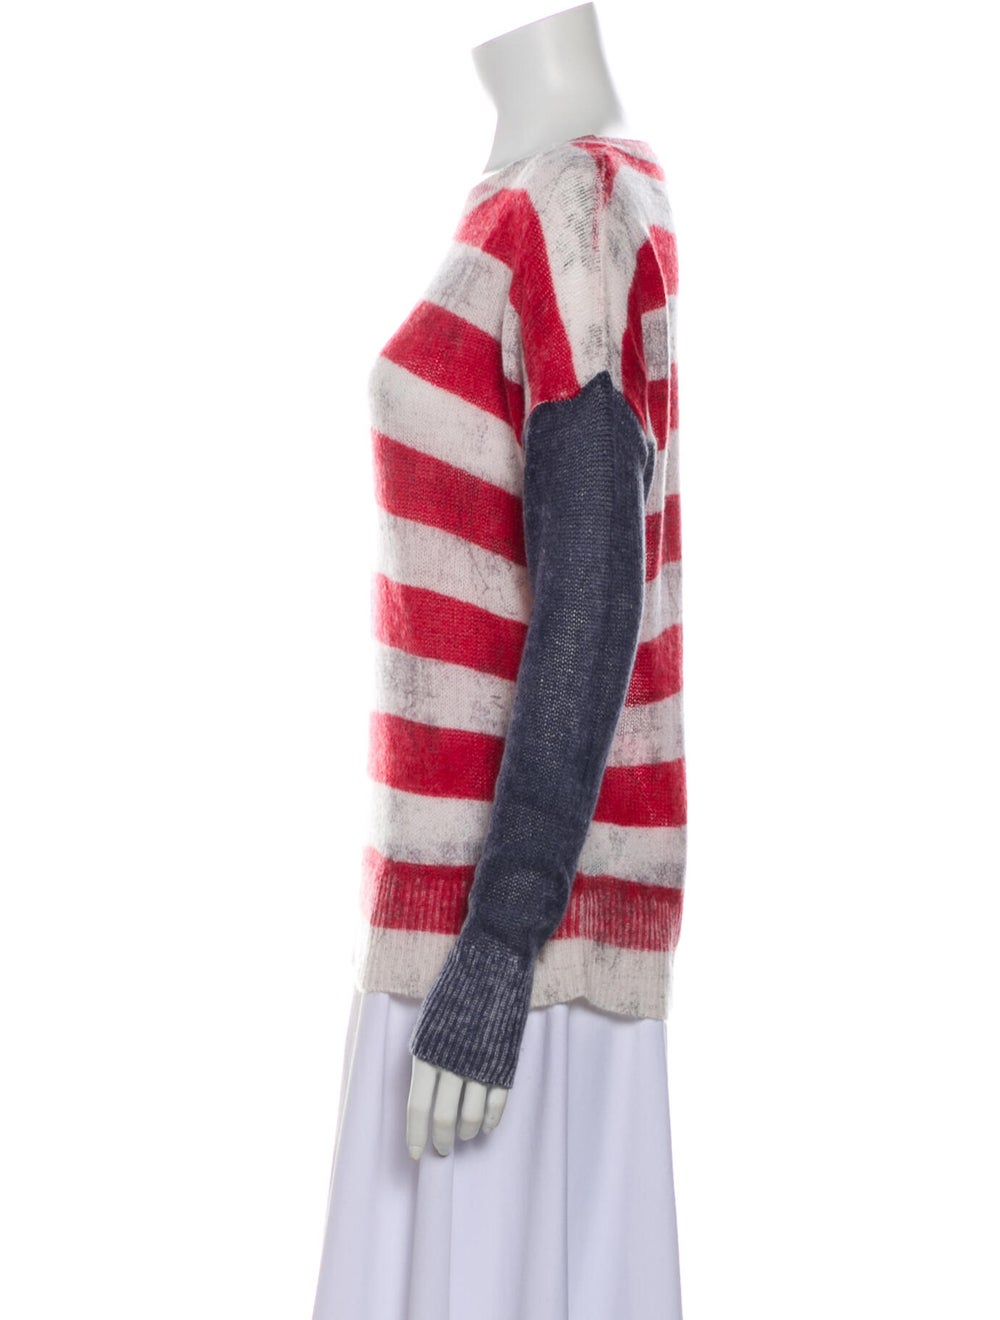 Skull Cashmere Cashmere Striped Sweater - image 2